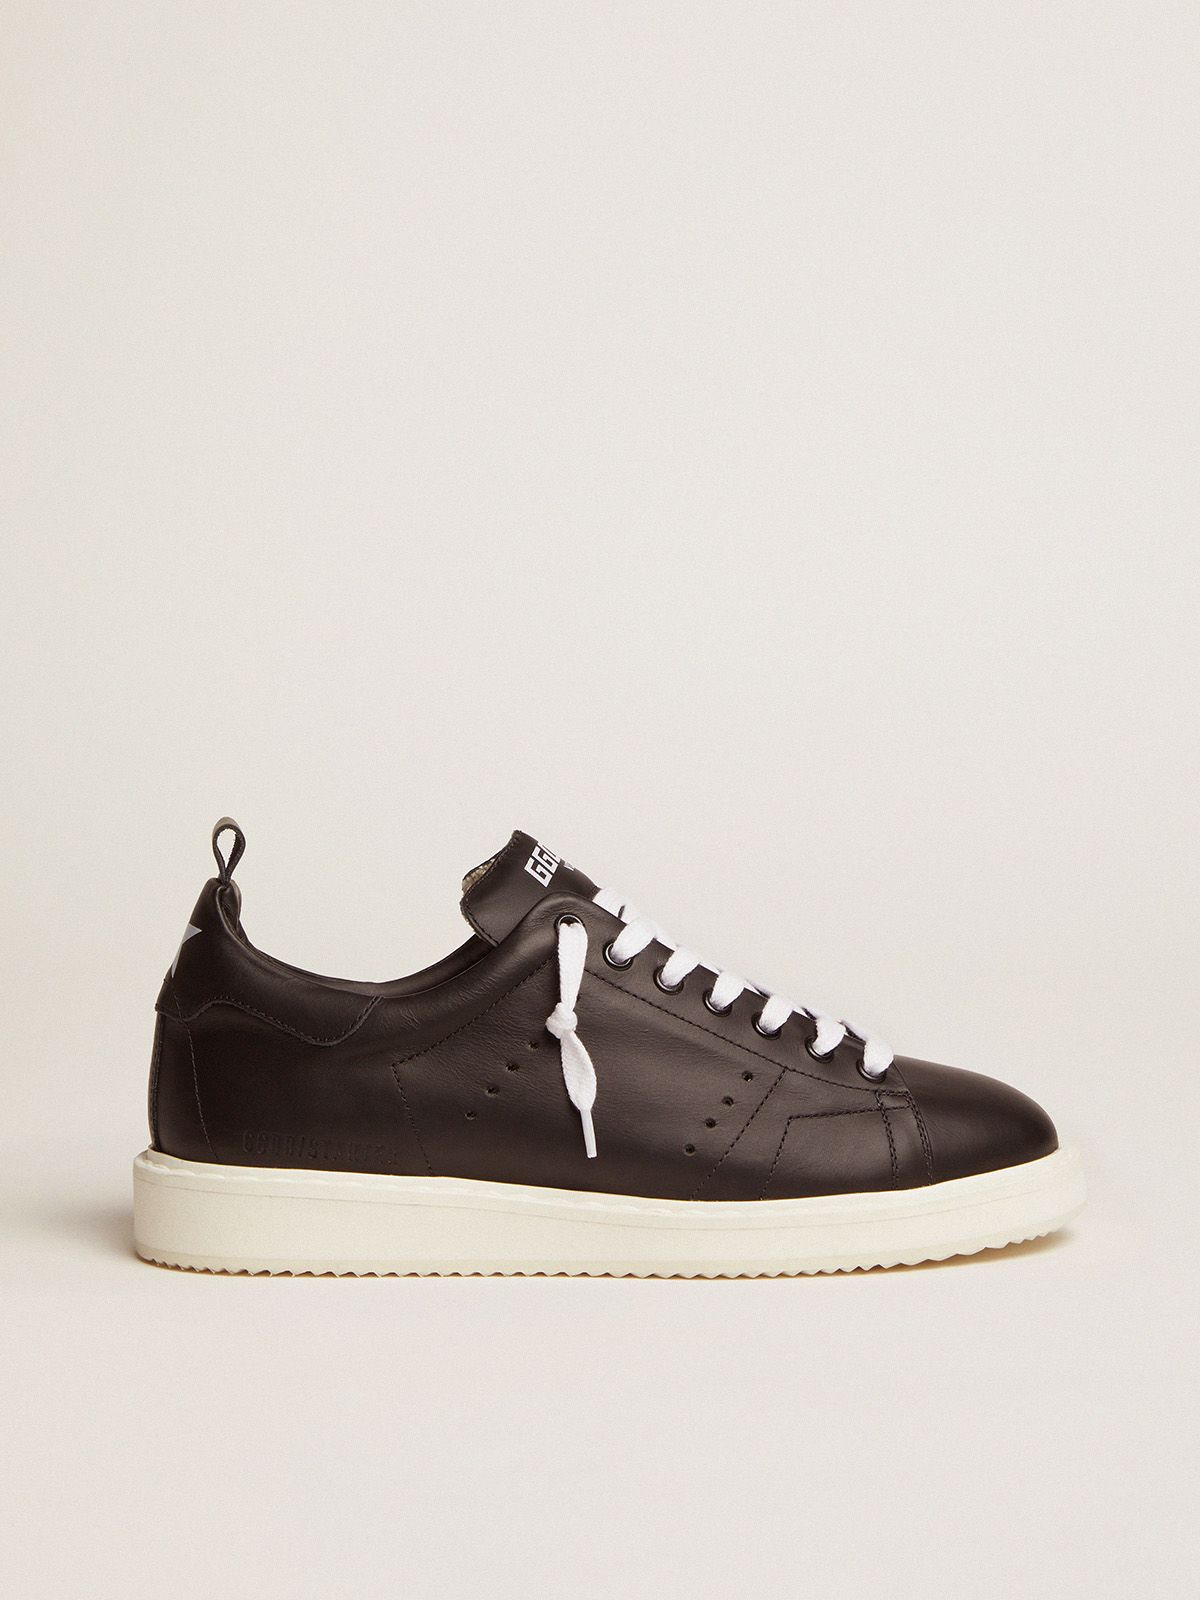 Golden Goose - Sneakers Starter in pelle total black in